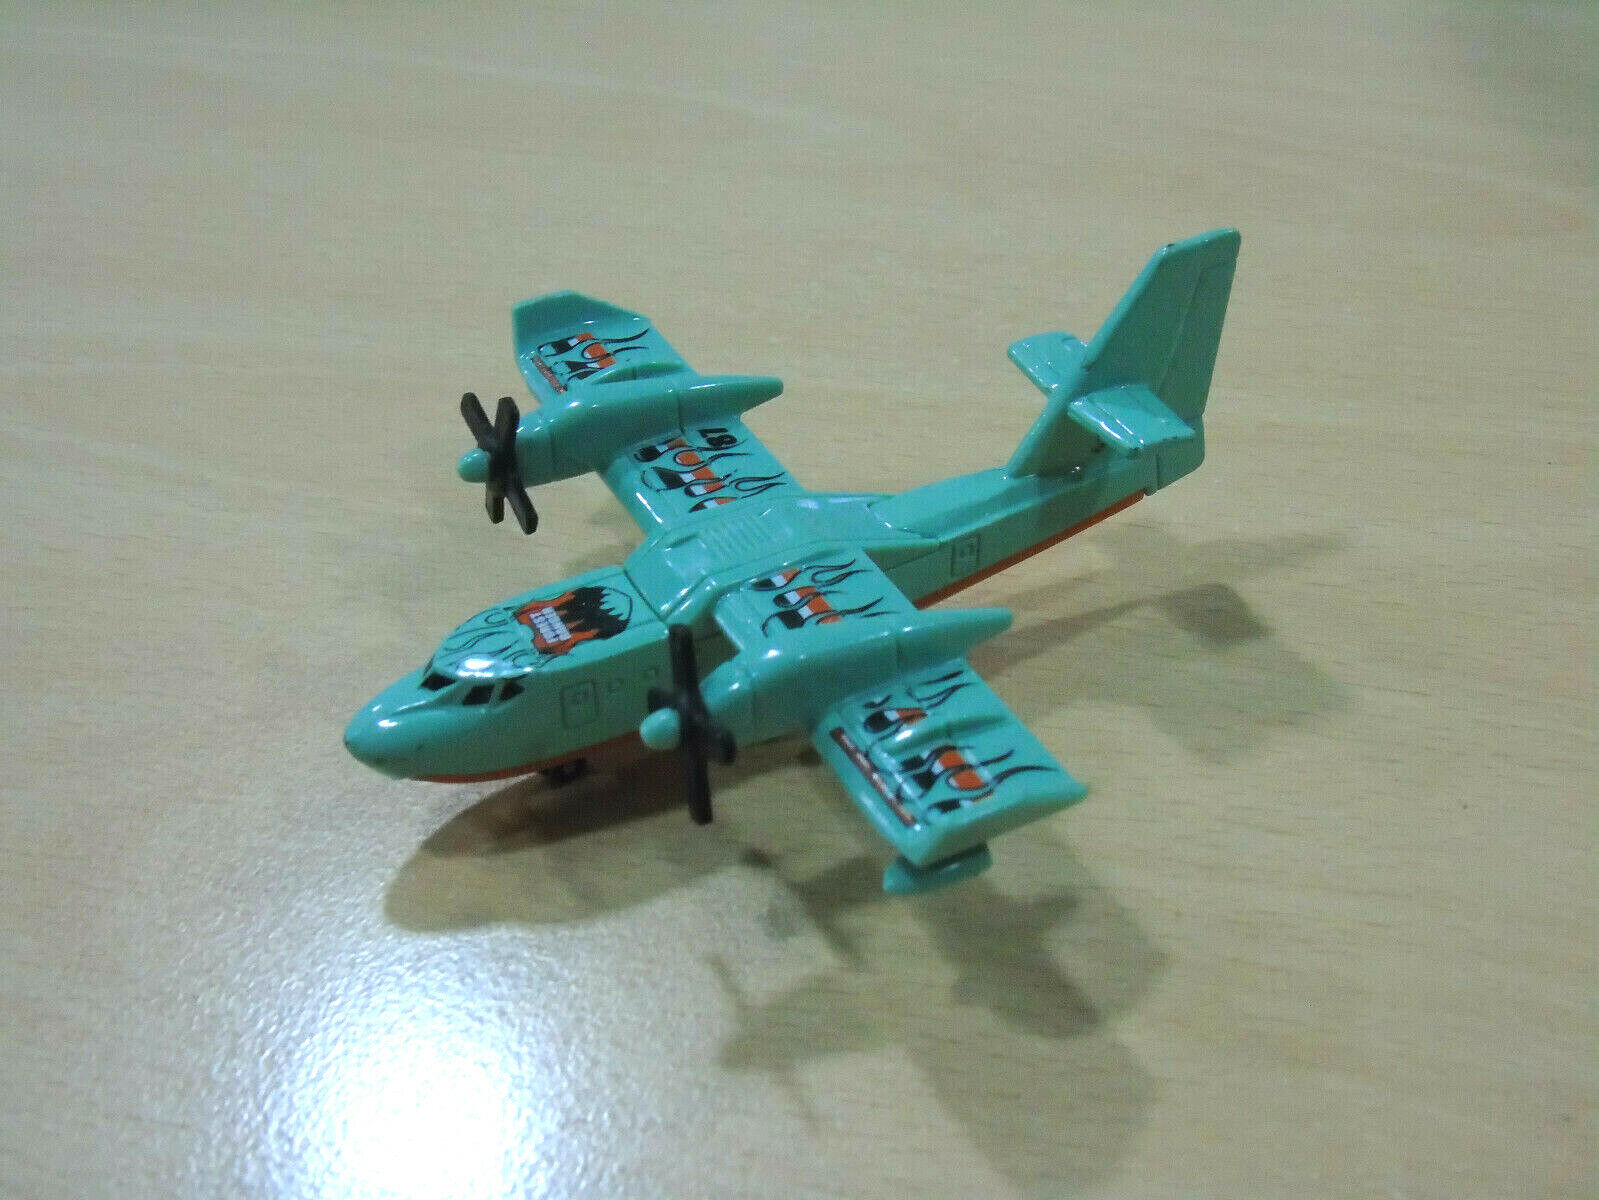 Matchbox 2009 Mattel Sb-87 Avión Modelo Blaze Buster Muy Raro